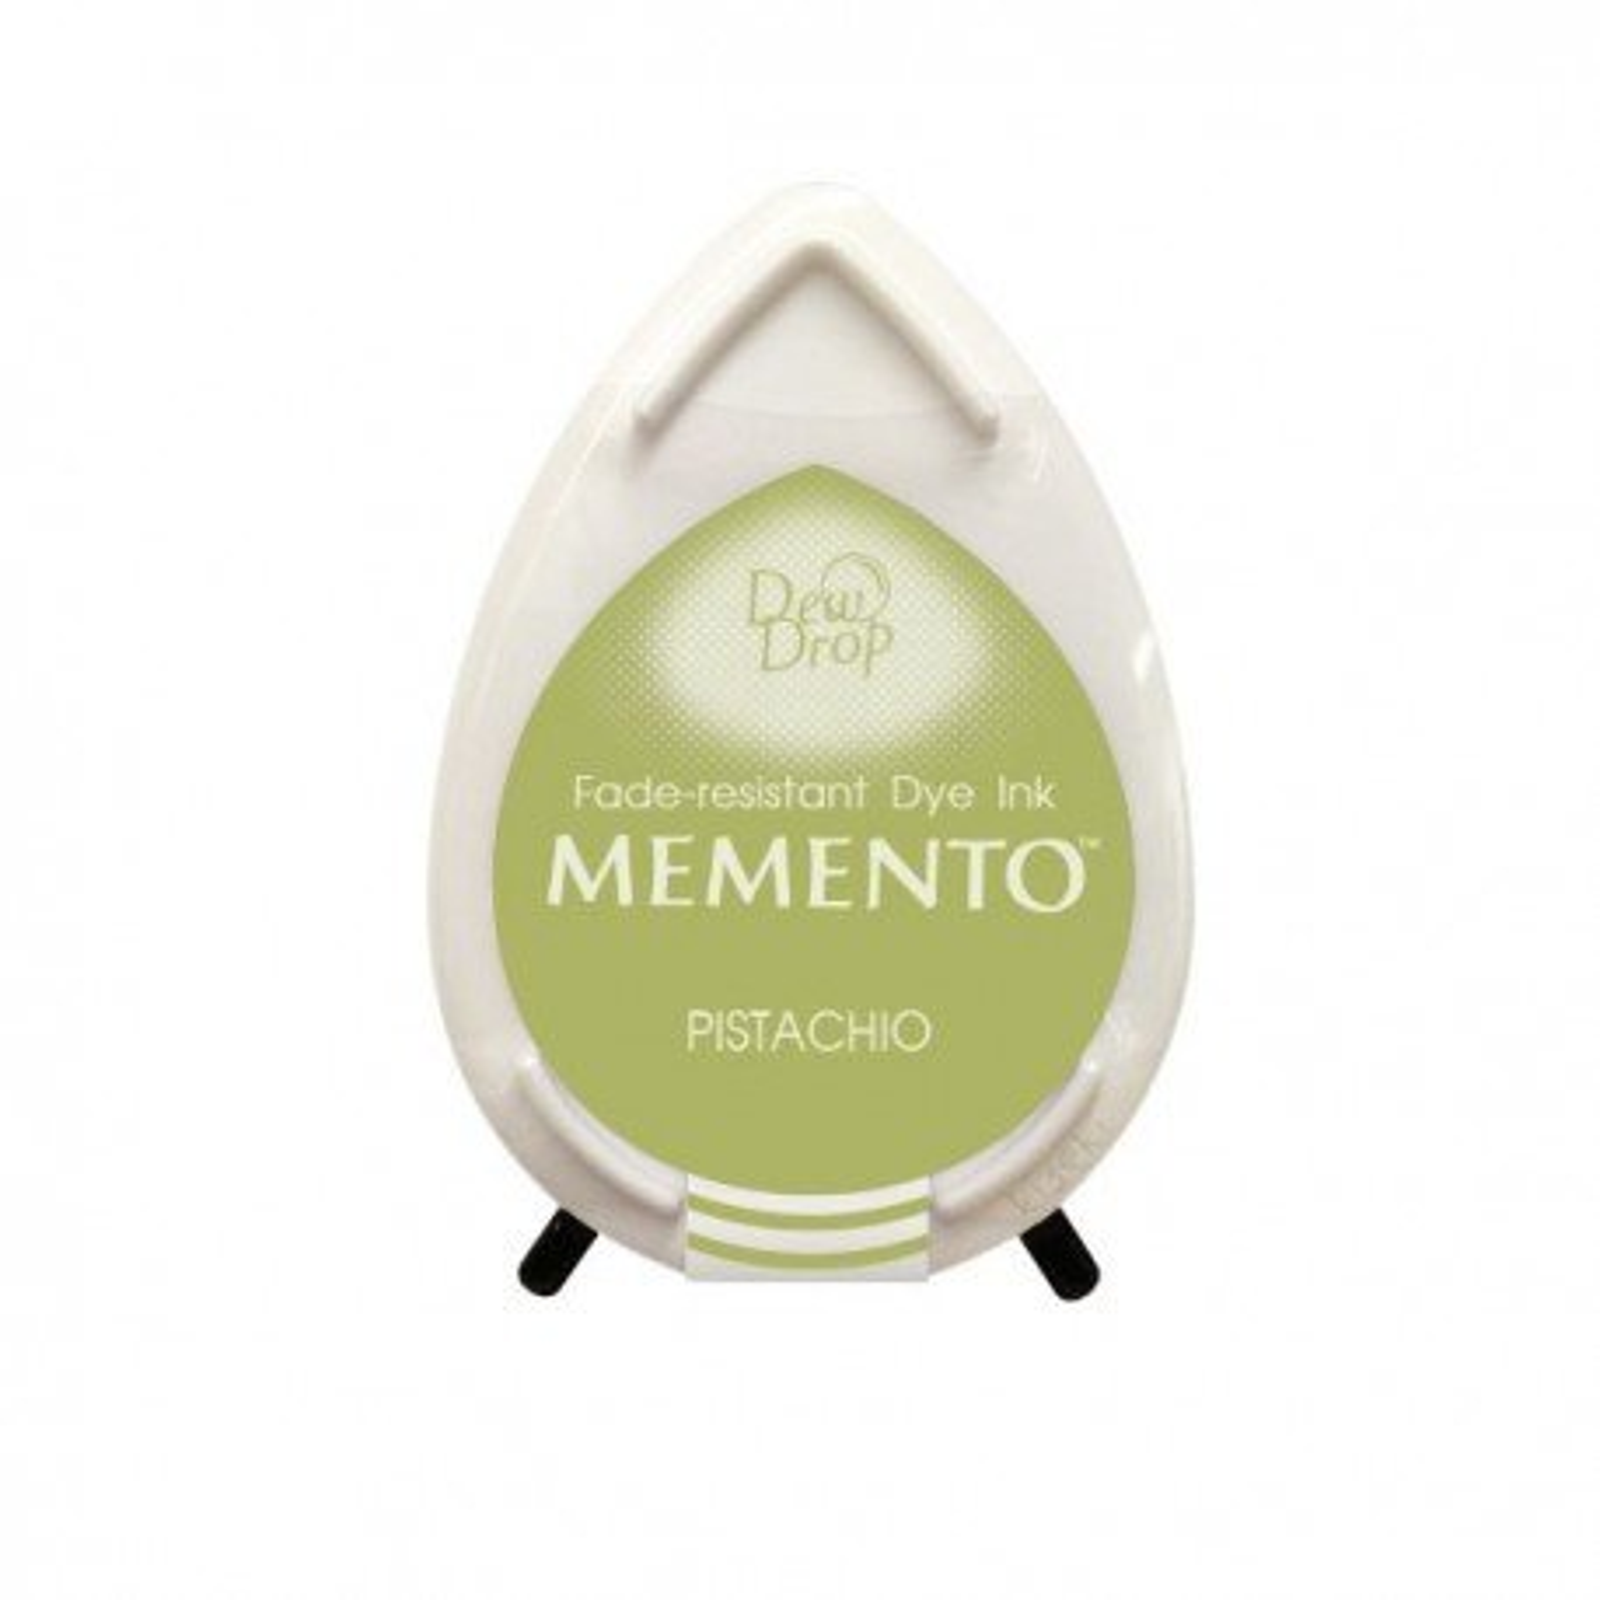 Mini encreur vert pistache Memento Dew Drop - Pistachio - Tsukineko